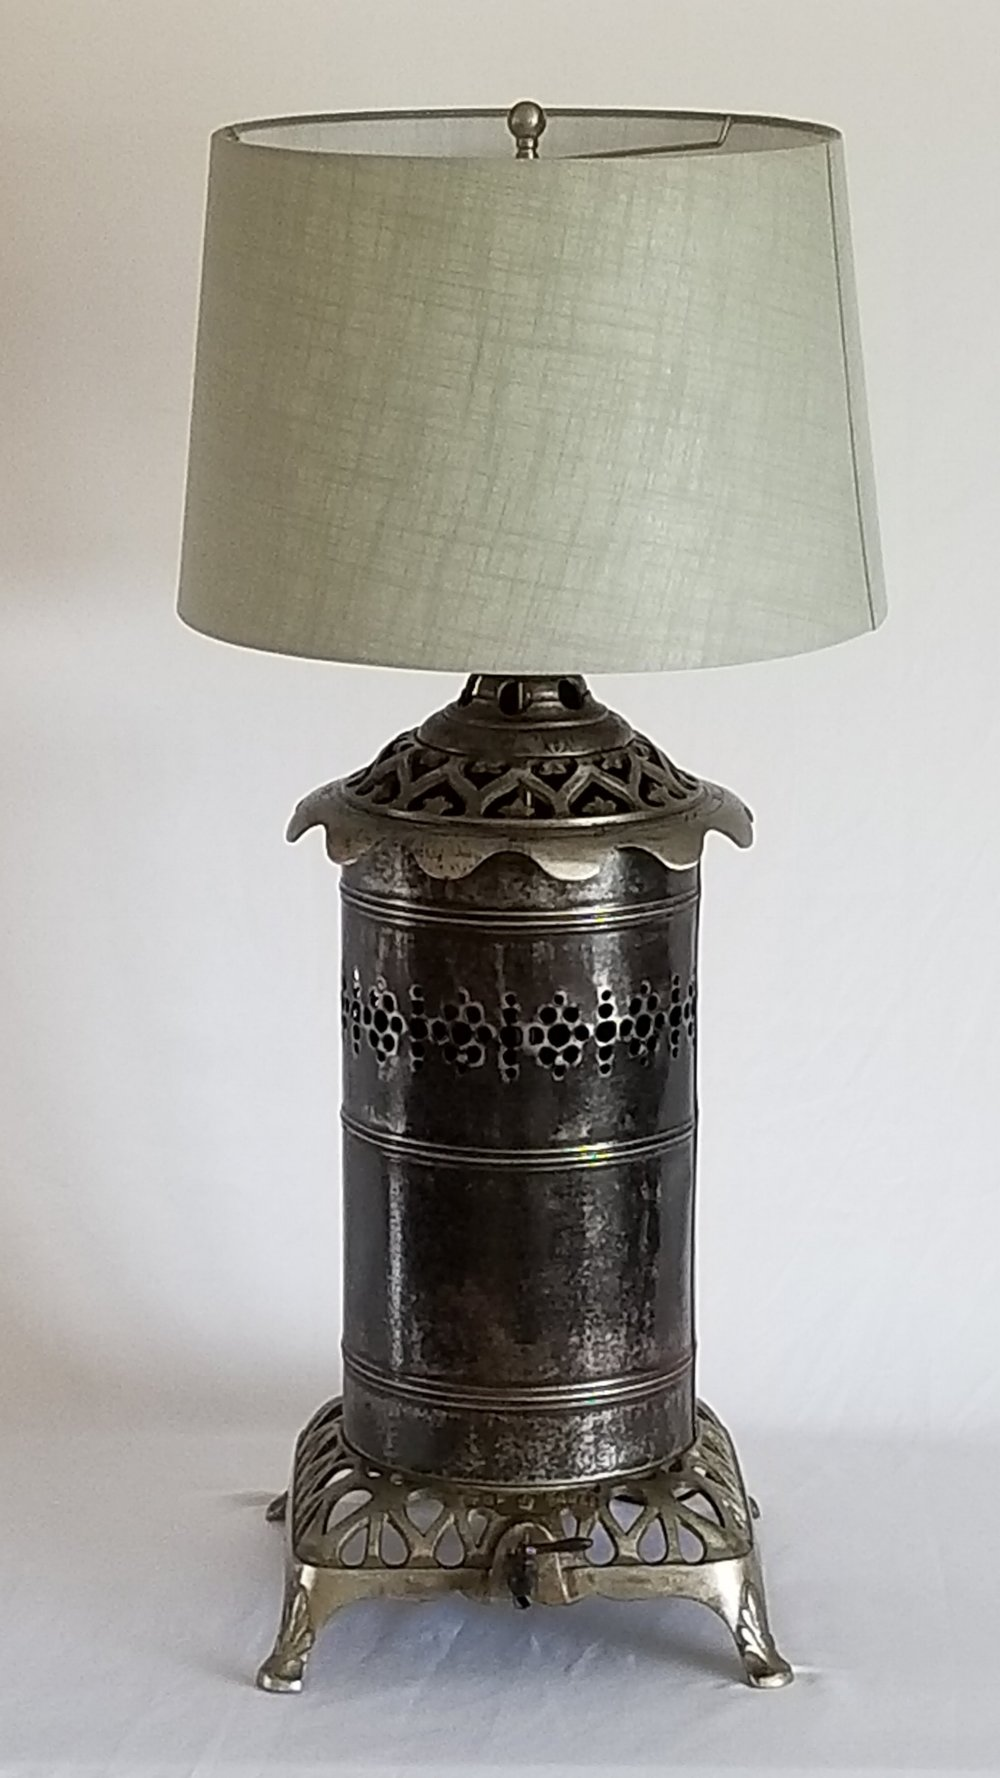 Gas Heater Lamp